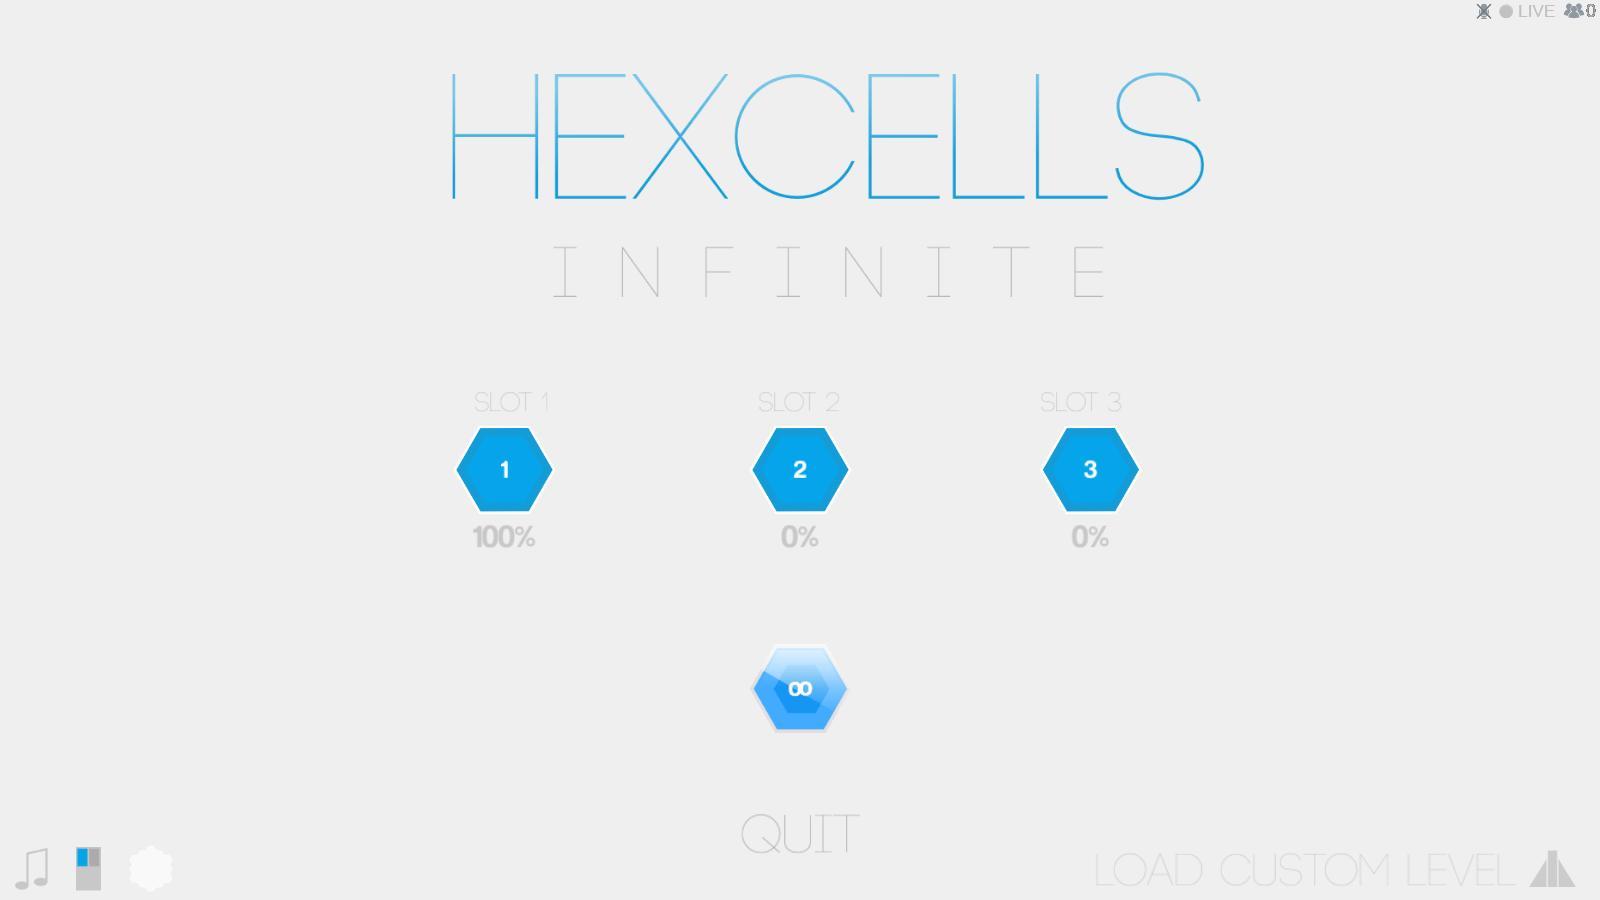 hexcells_08.jpg